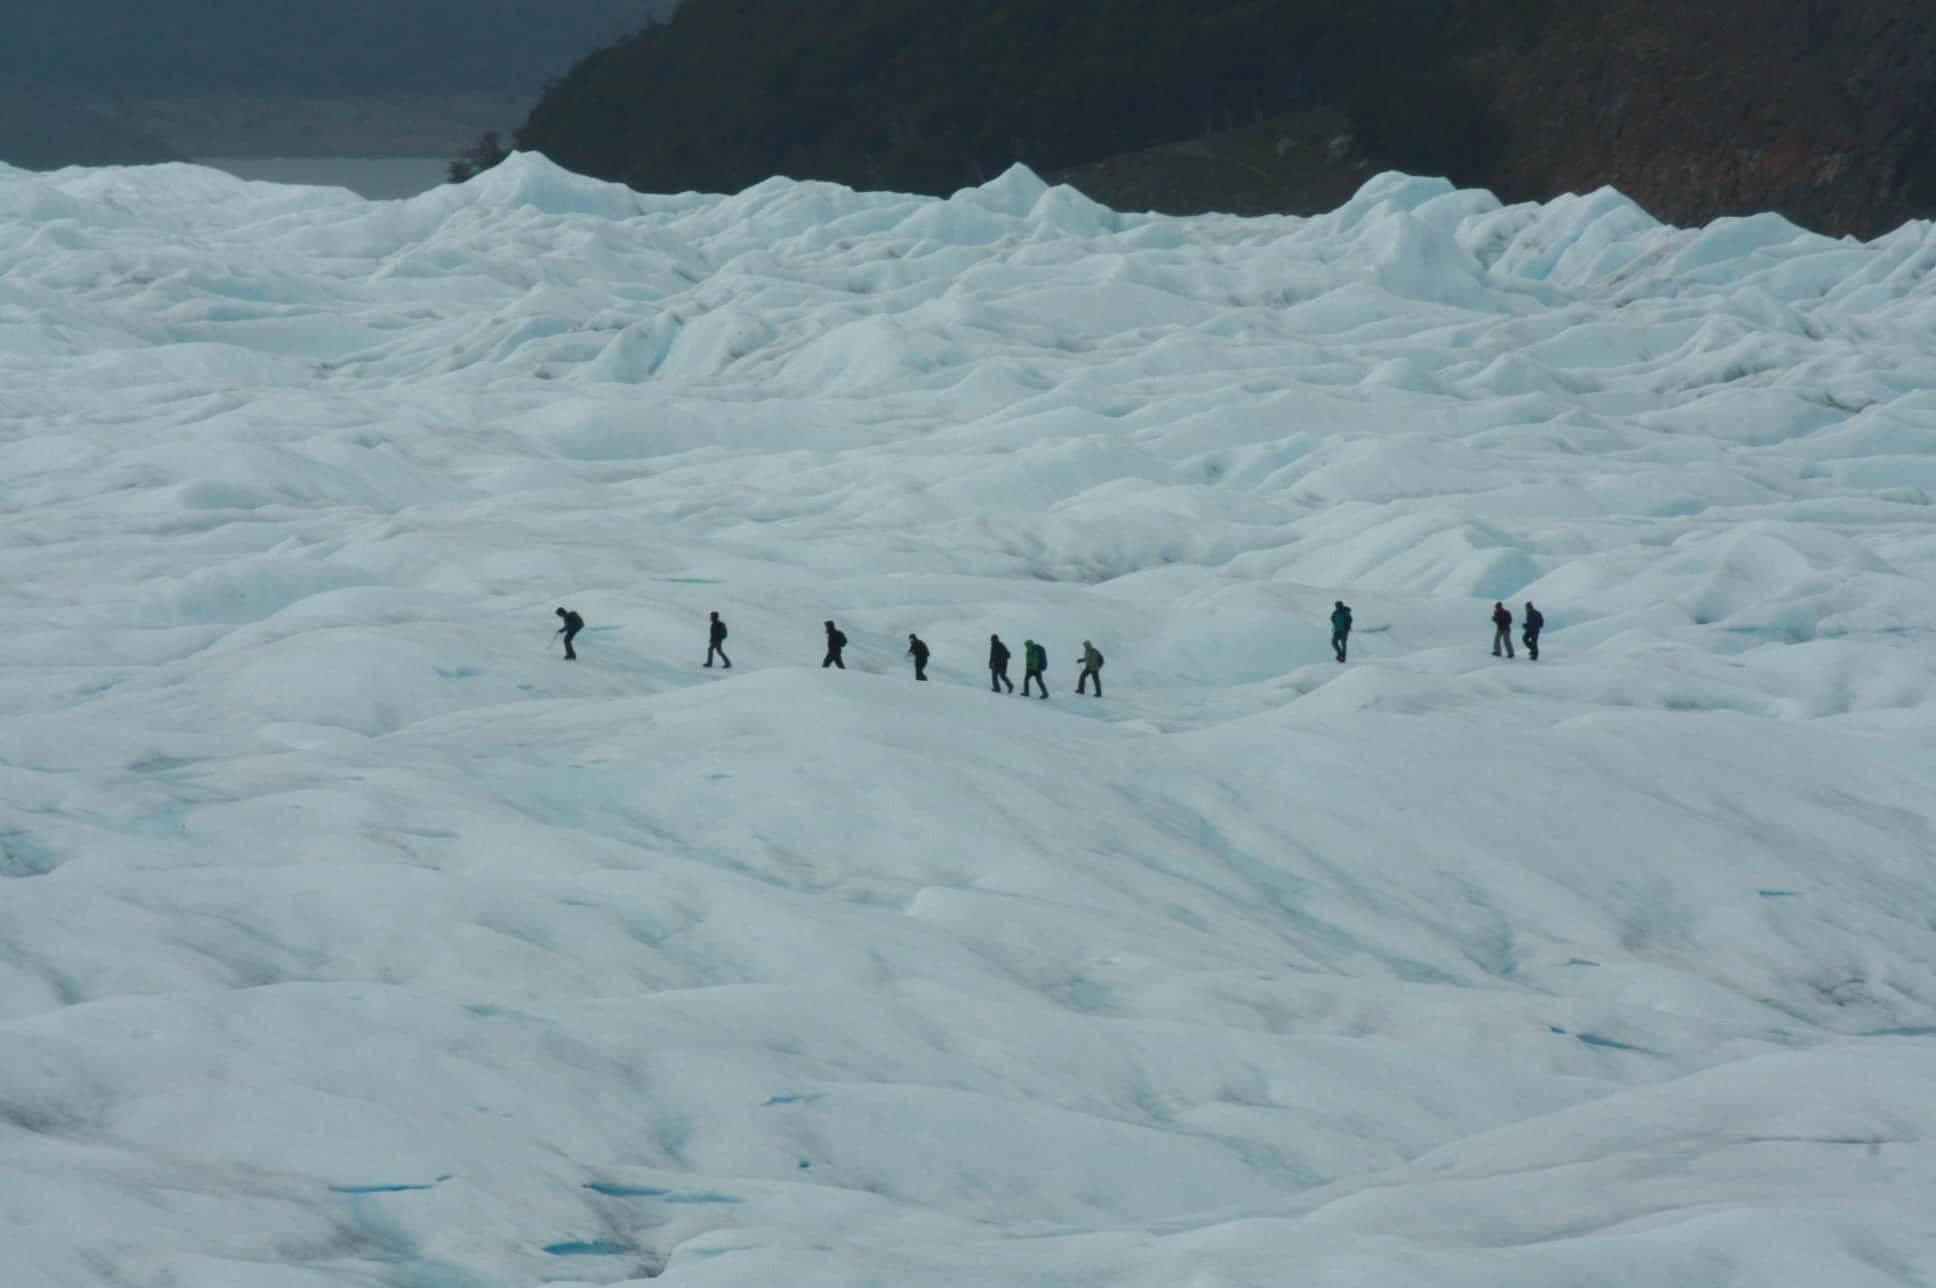 The amazing Perito Moreno Glacier, El Calafate, Argentina.